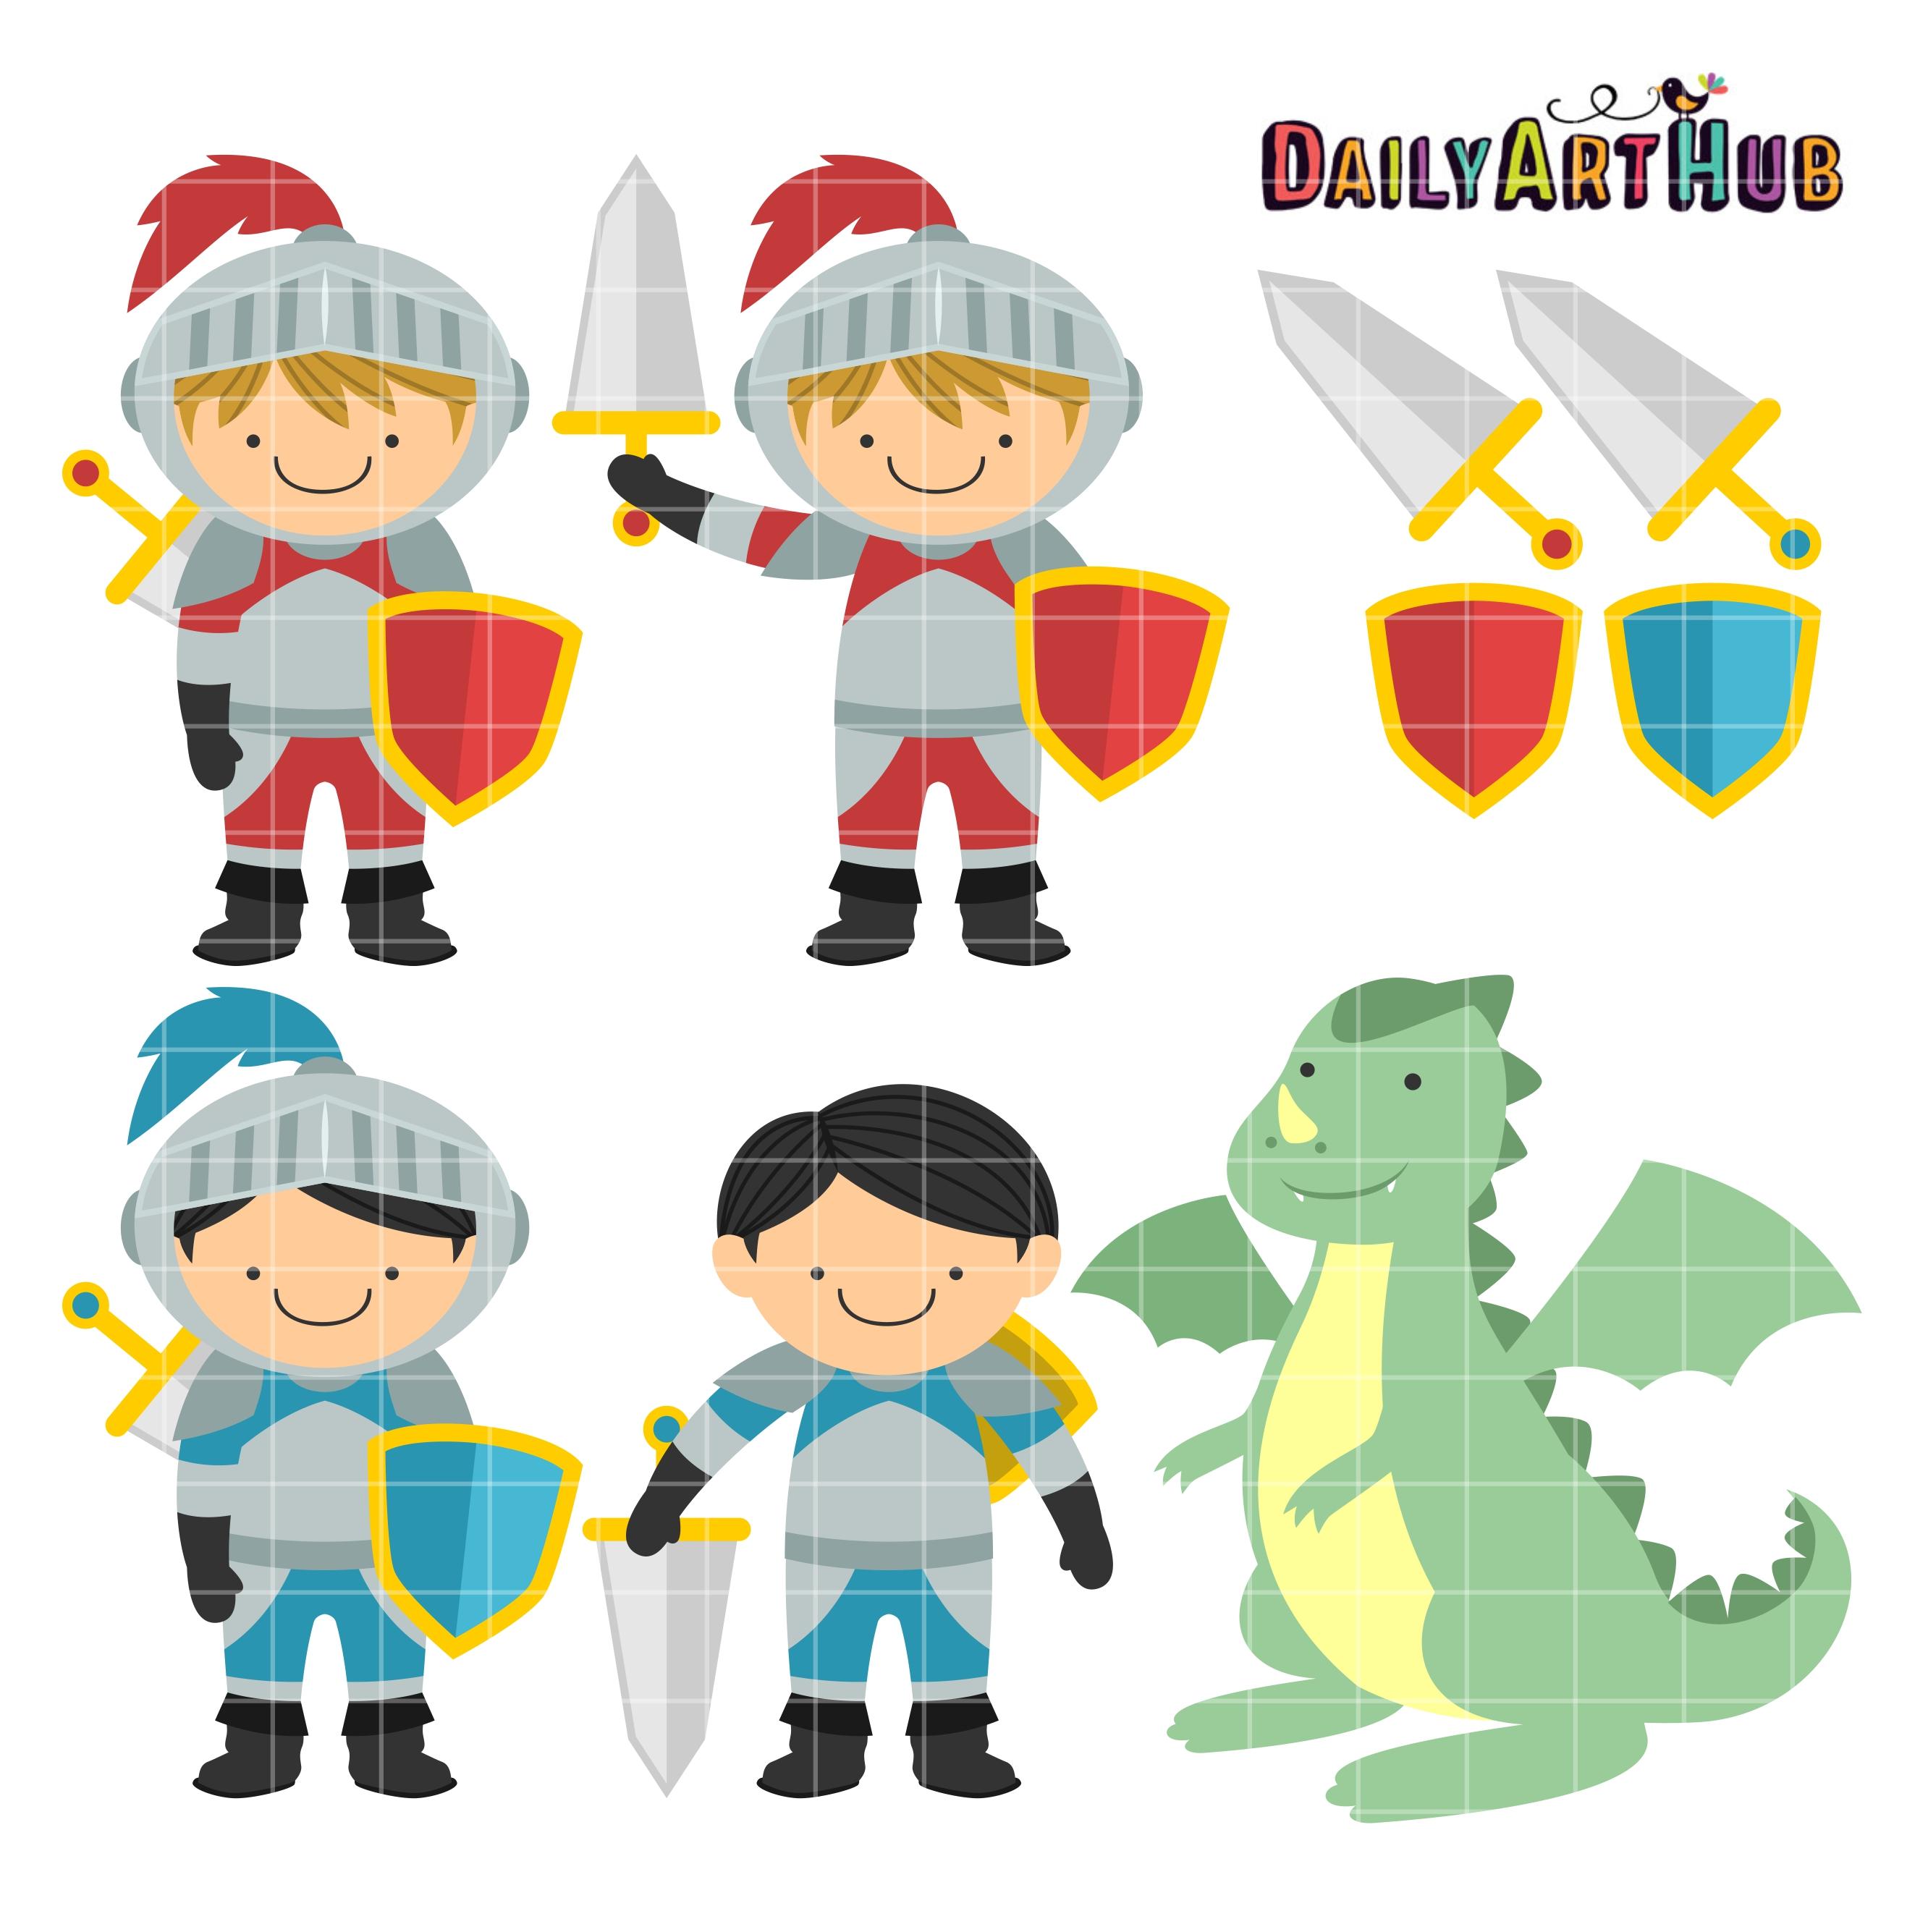 2664x2670 Cute Knights And Dragon Clip Art Set Daily Art Hub